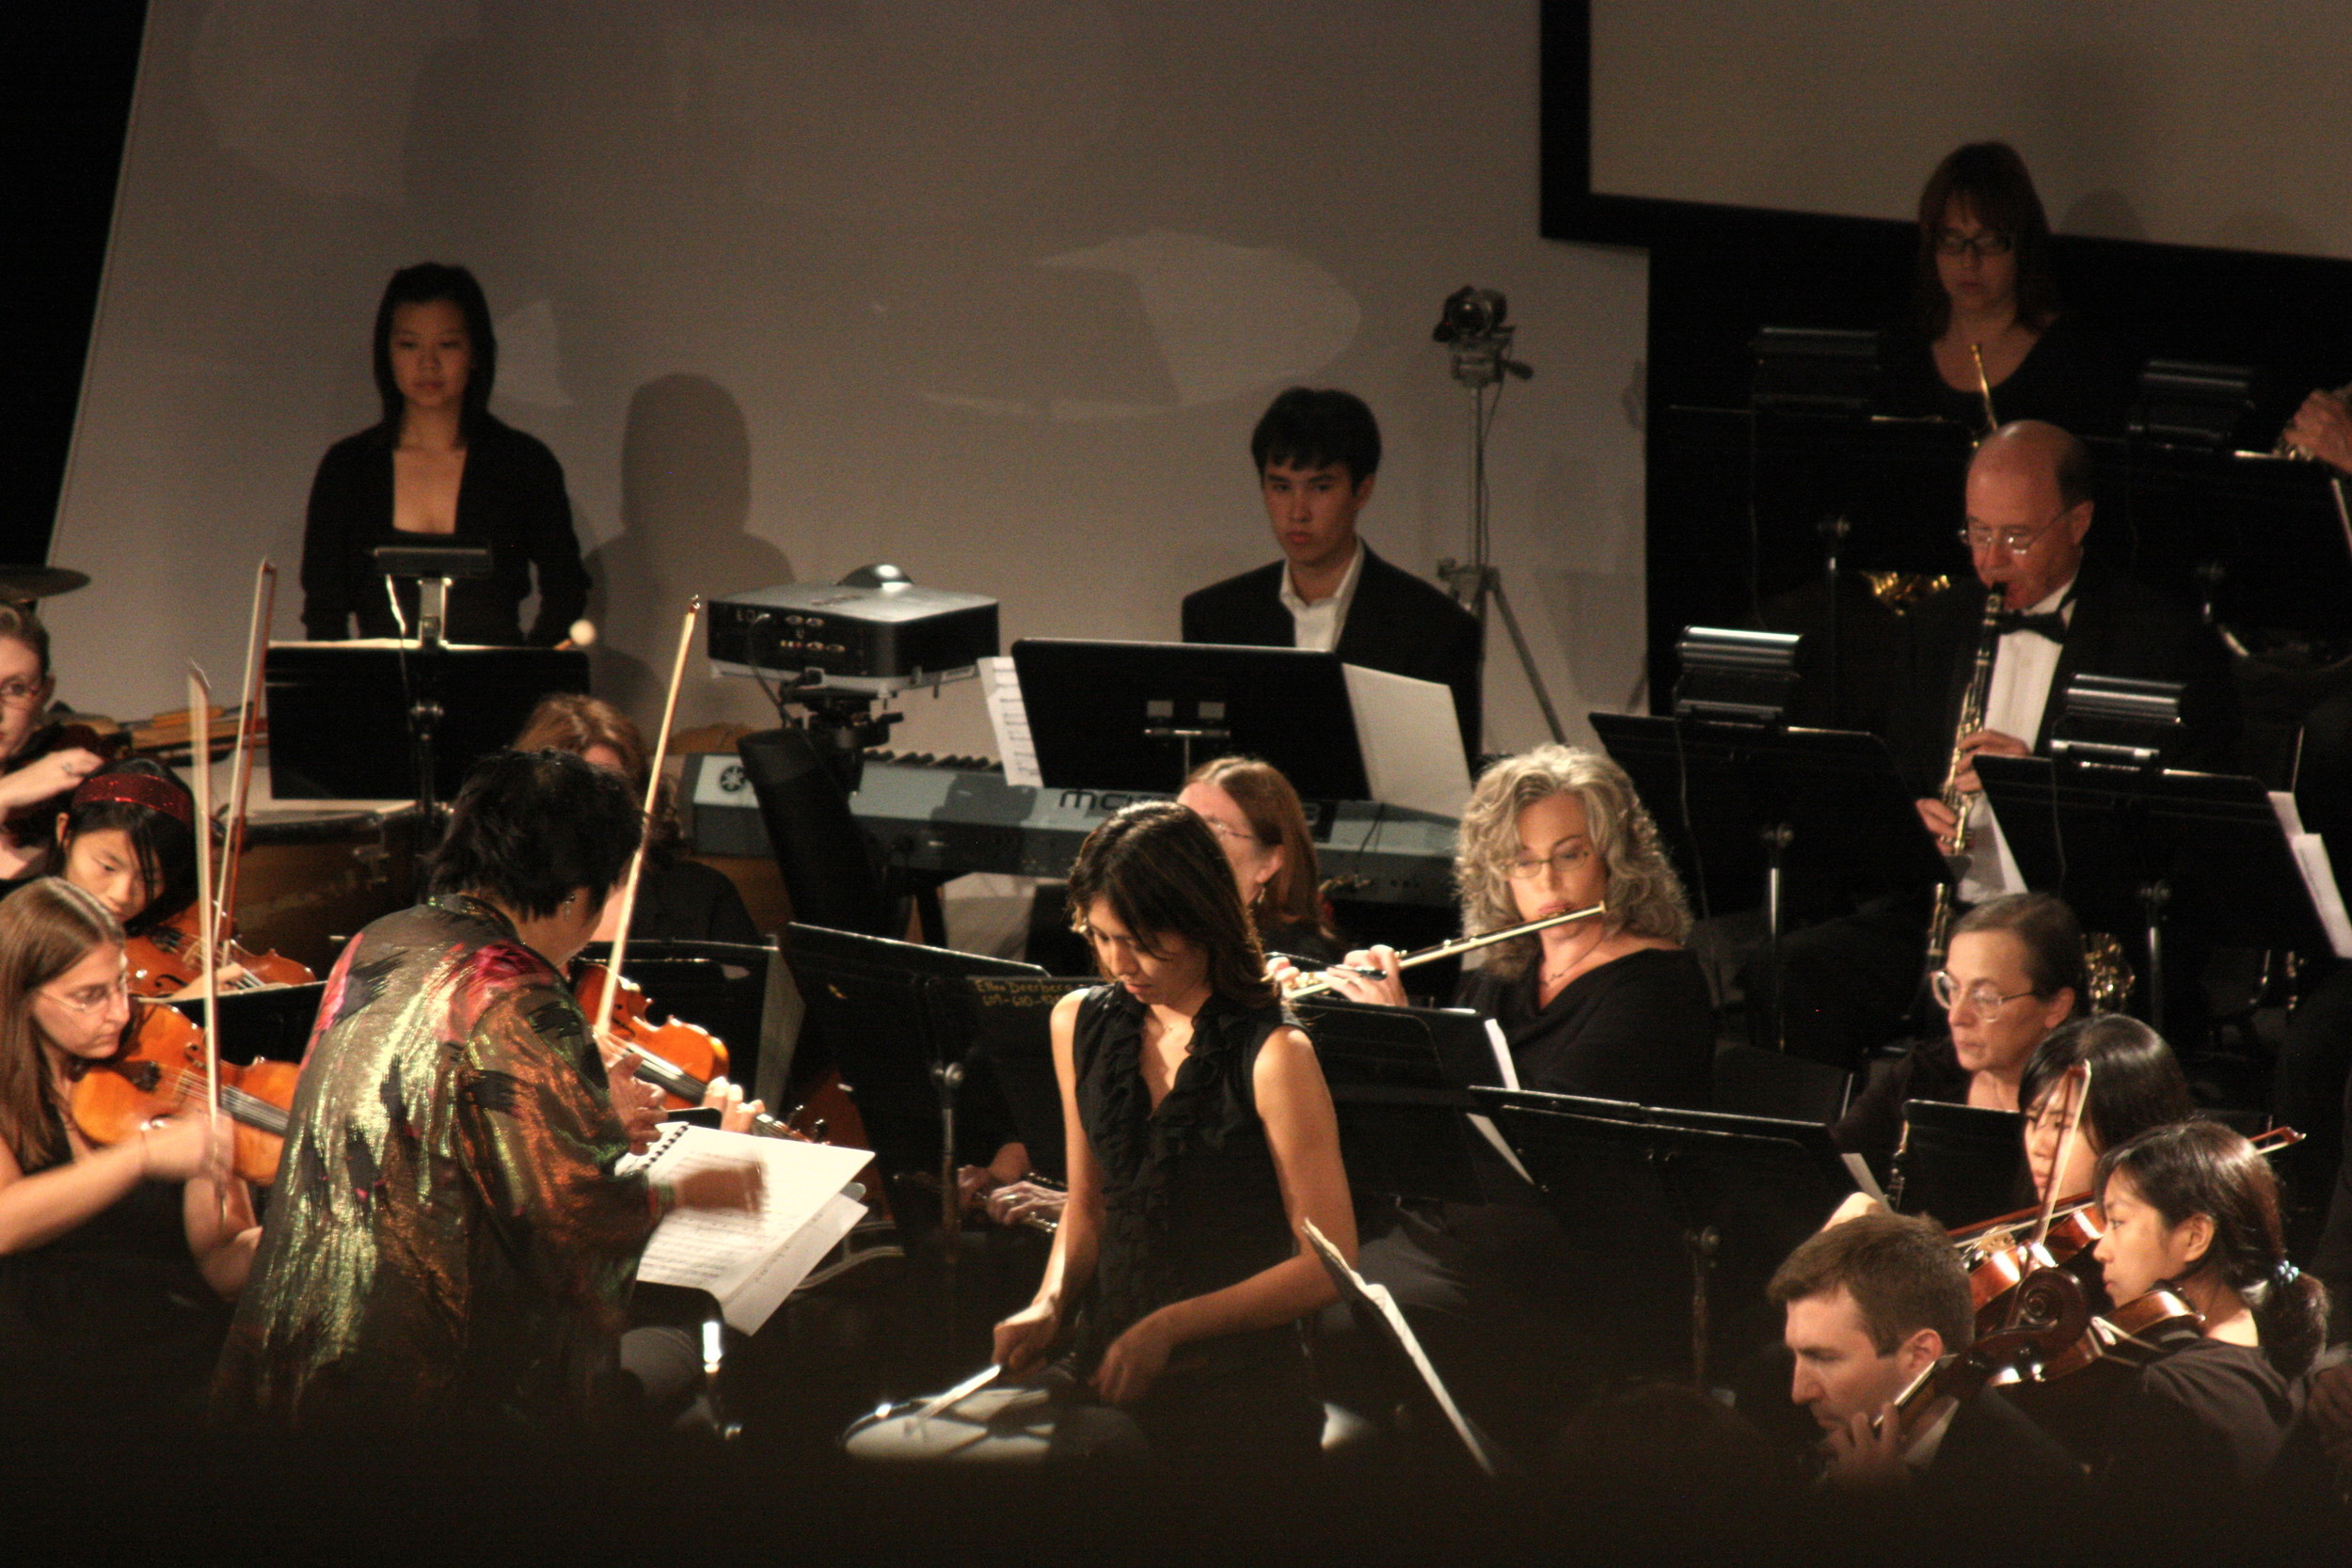 Intense snare work by Aya Kaminaguchi-Singer in Ravel's Bolero